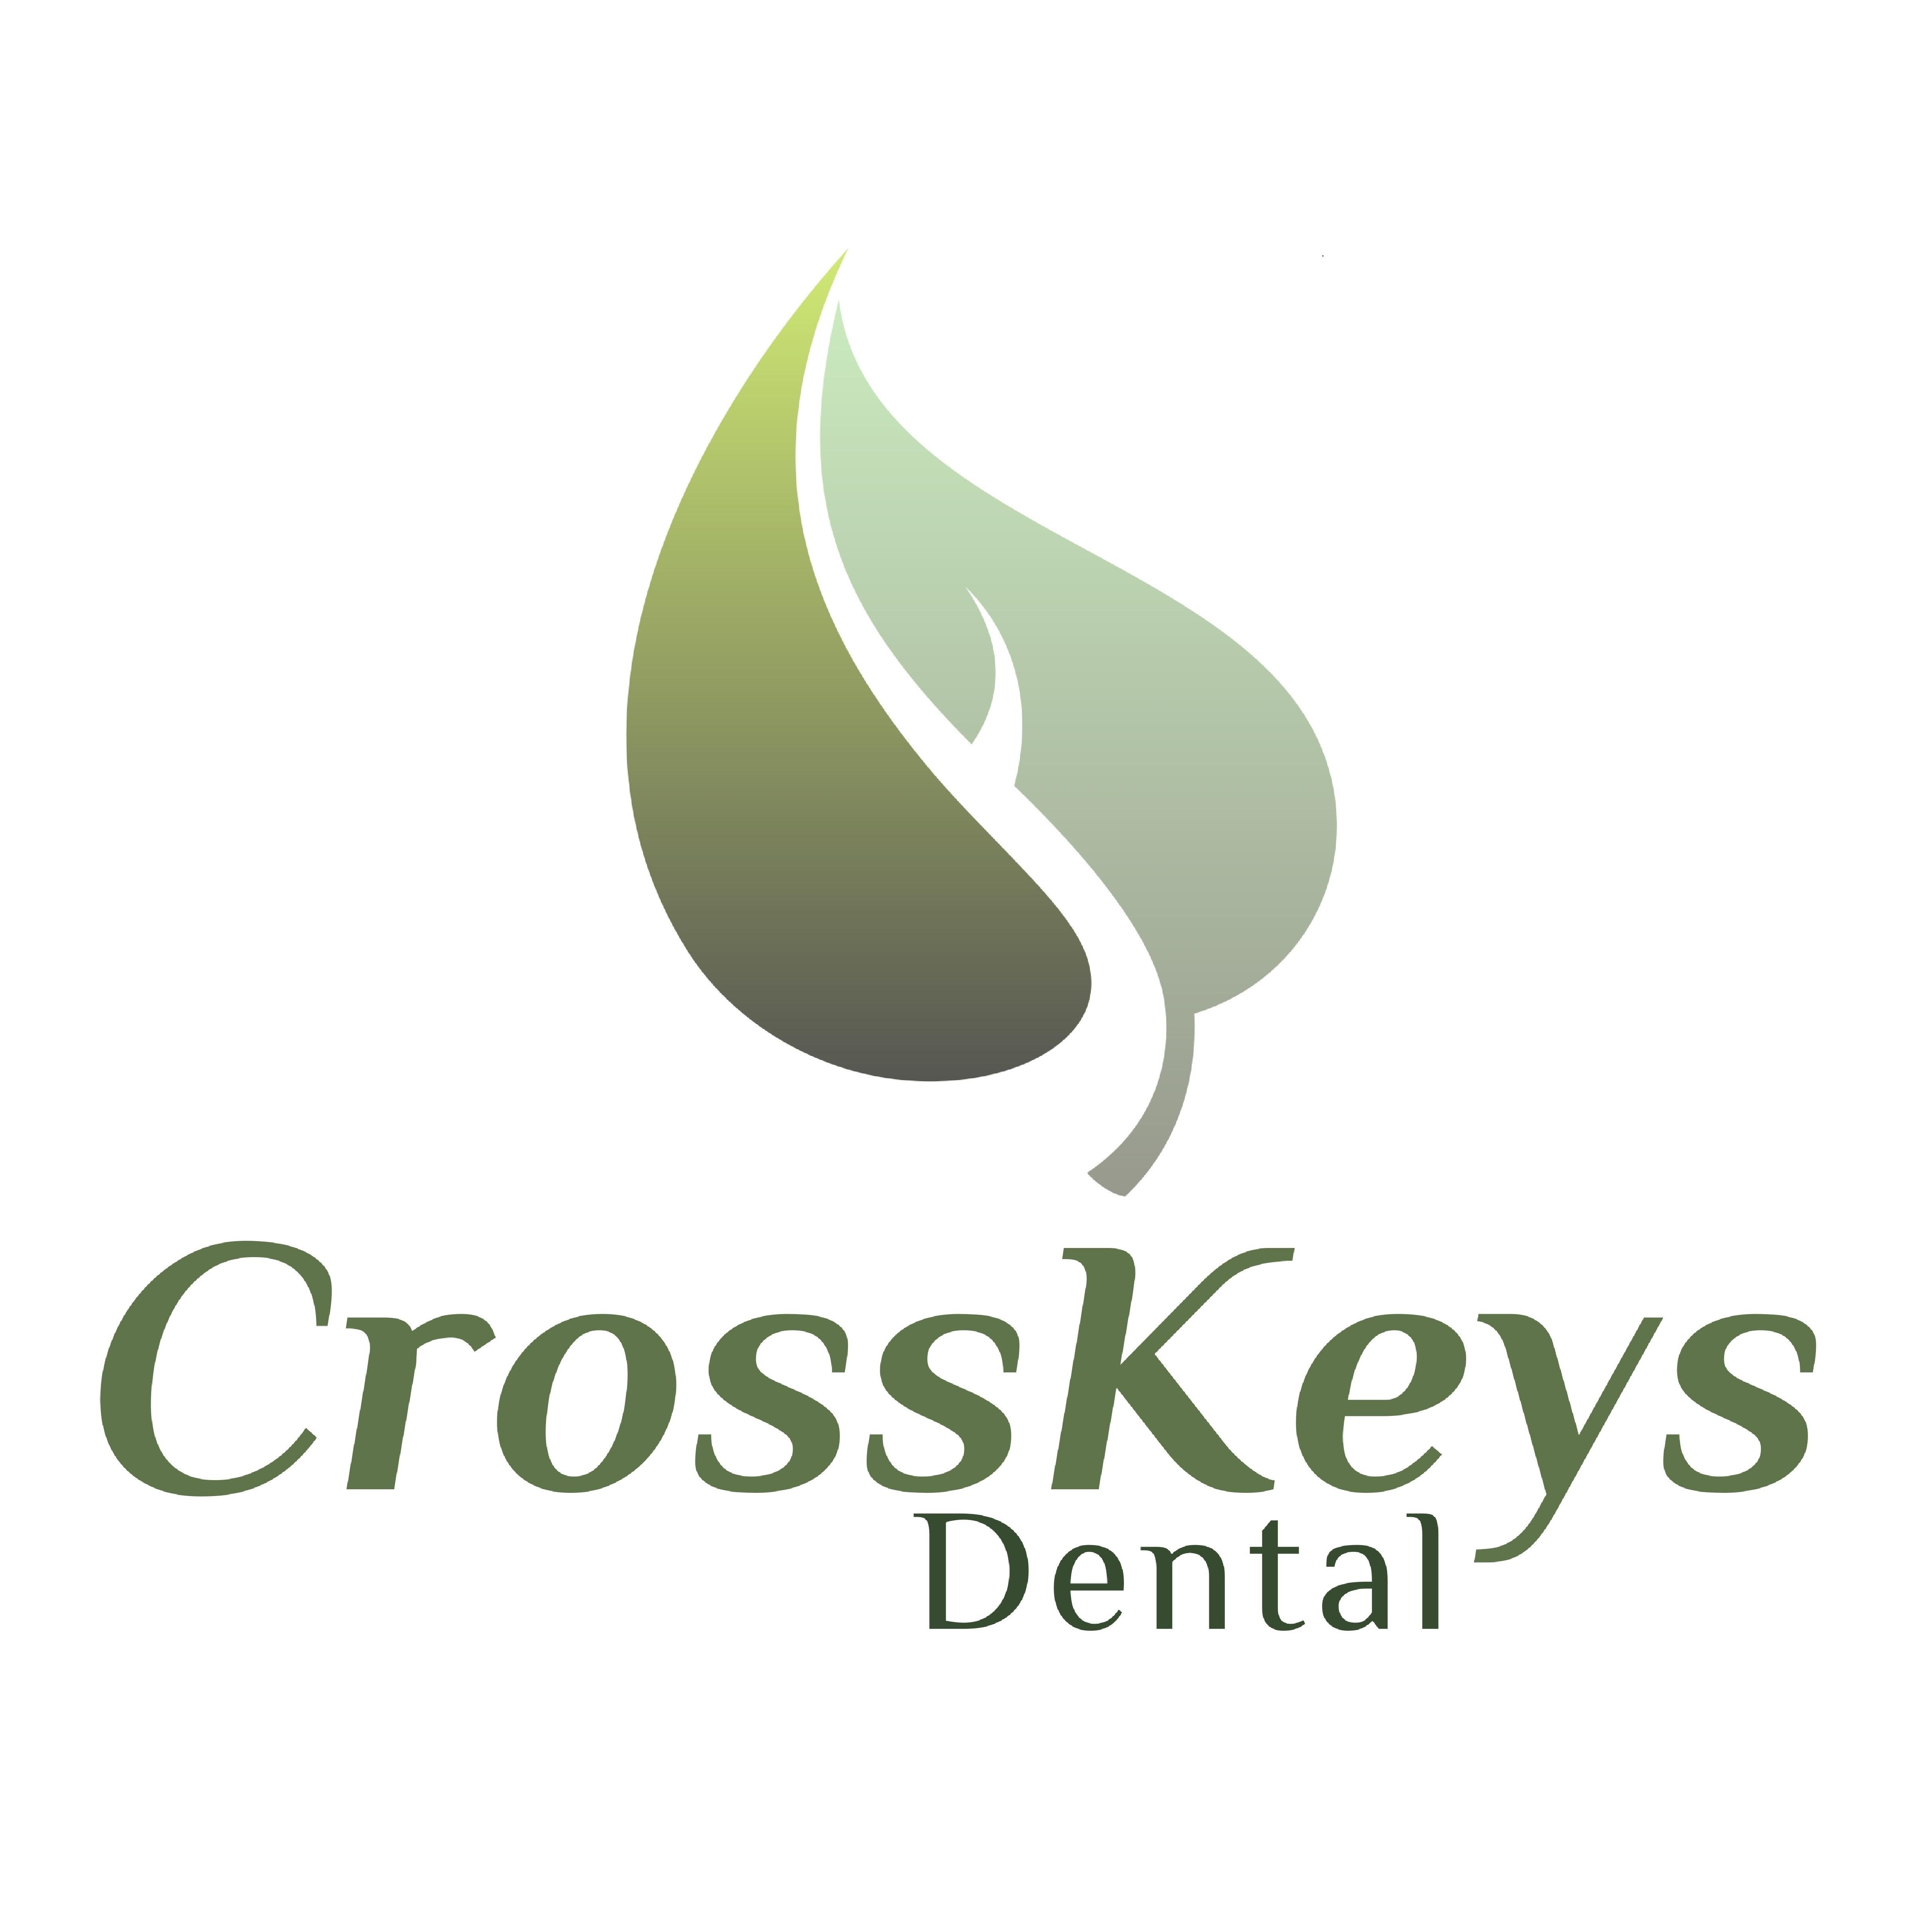 CrossKeys Dental image 5